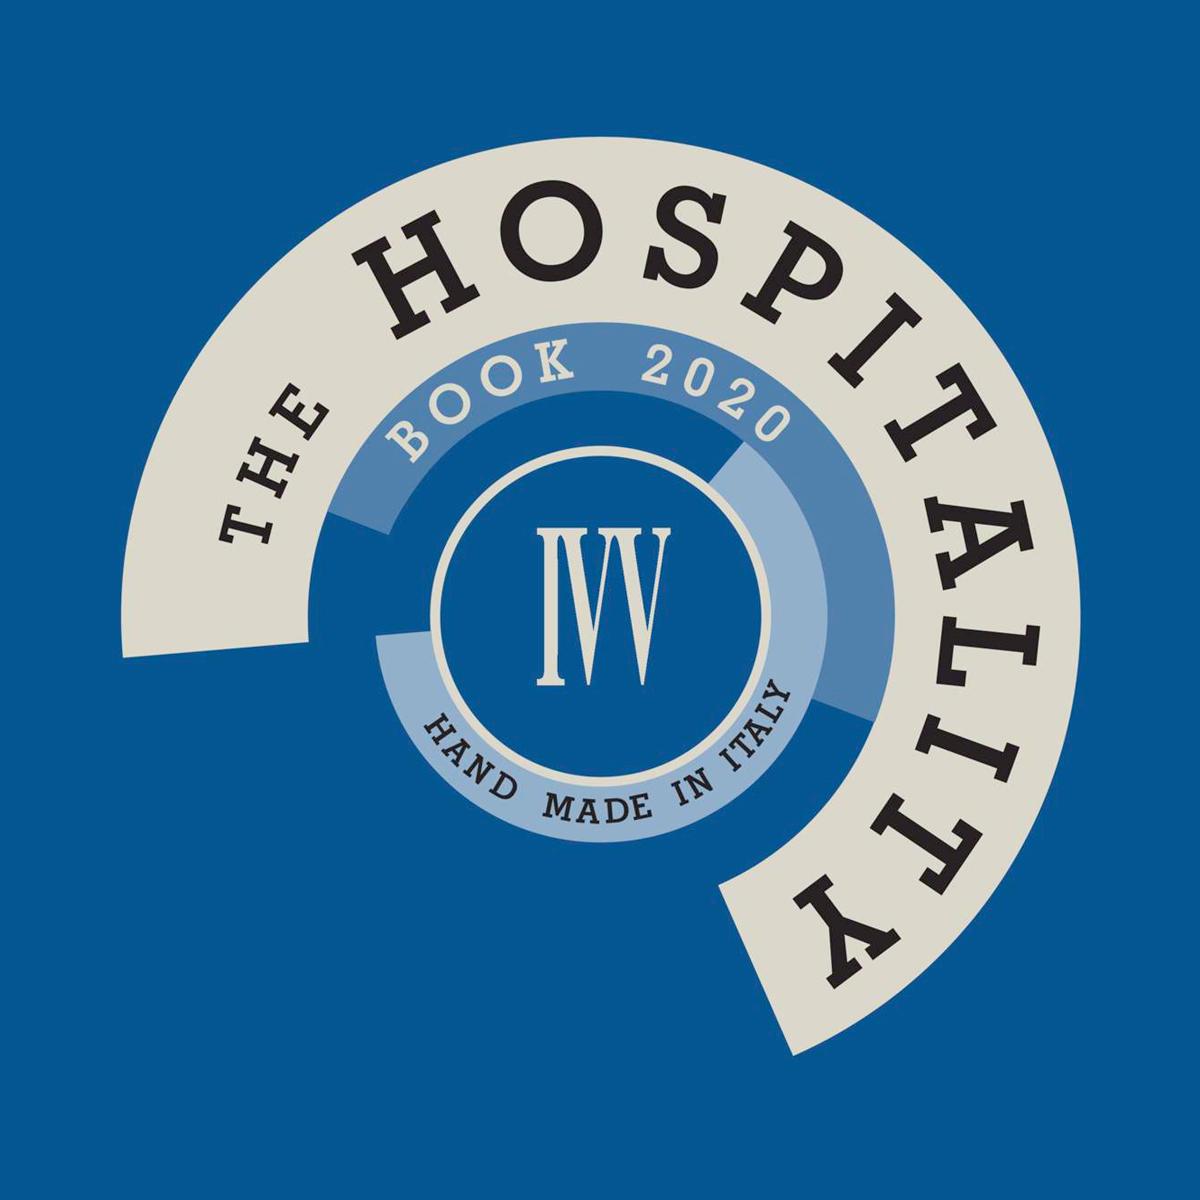 The-Hospitality-Book-2020